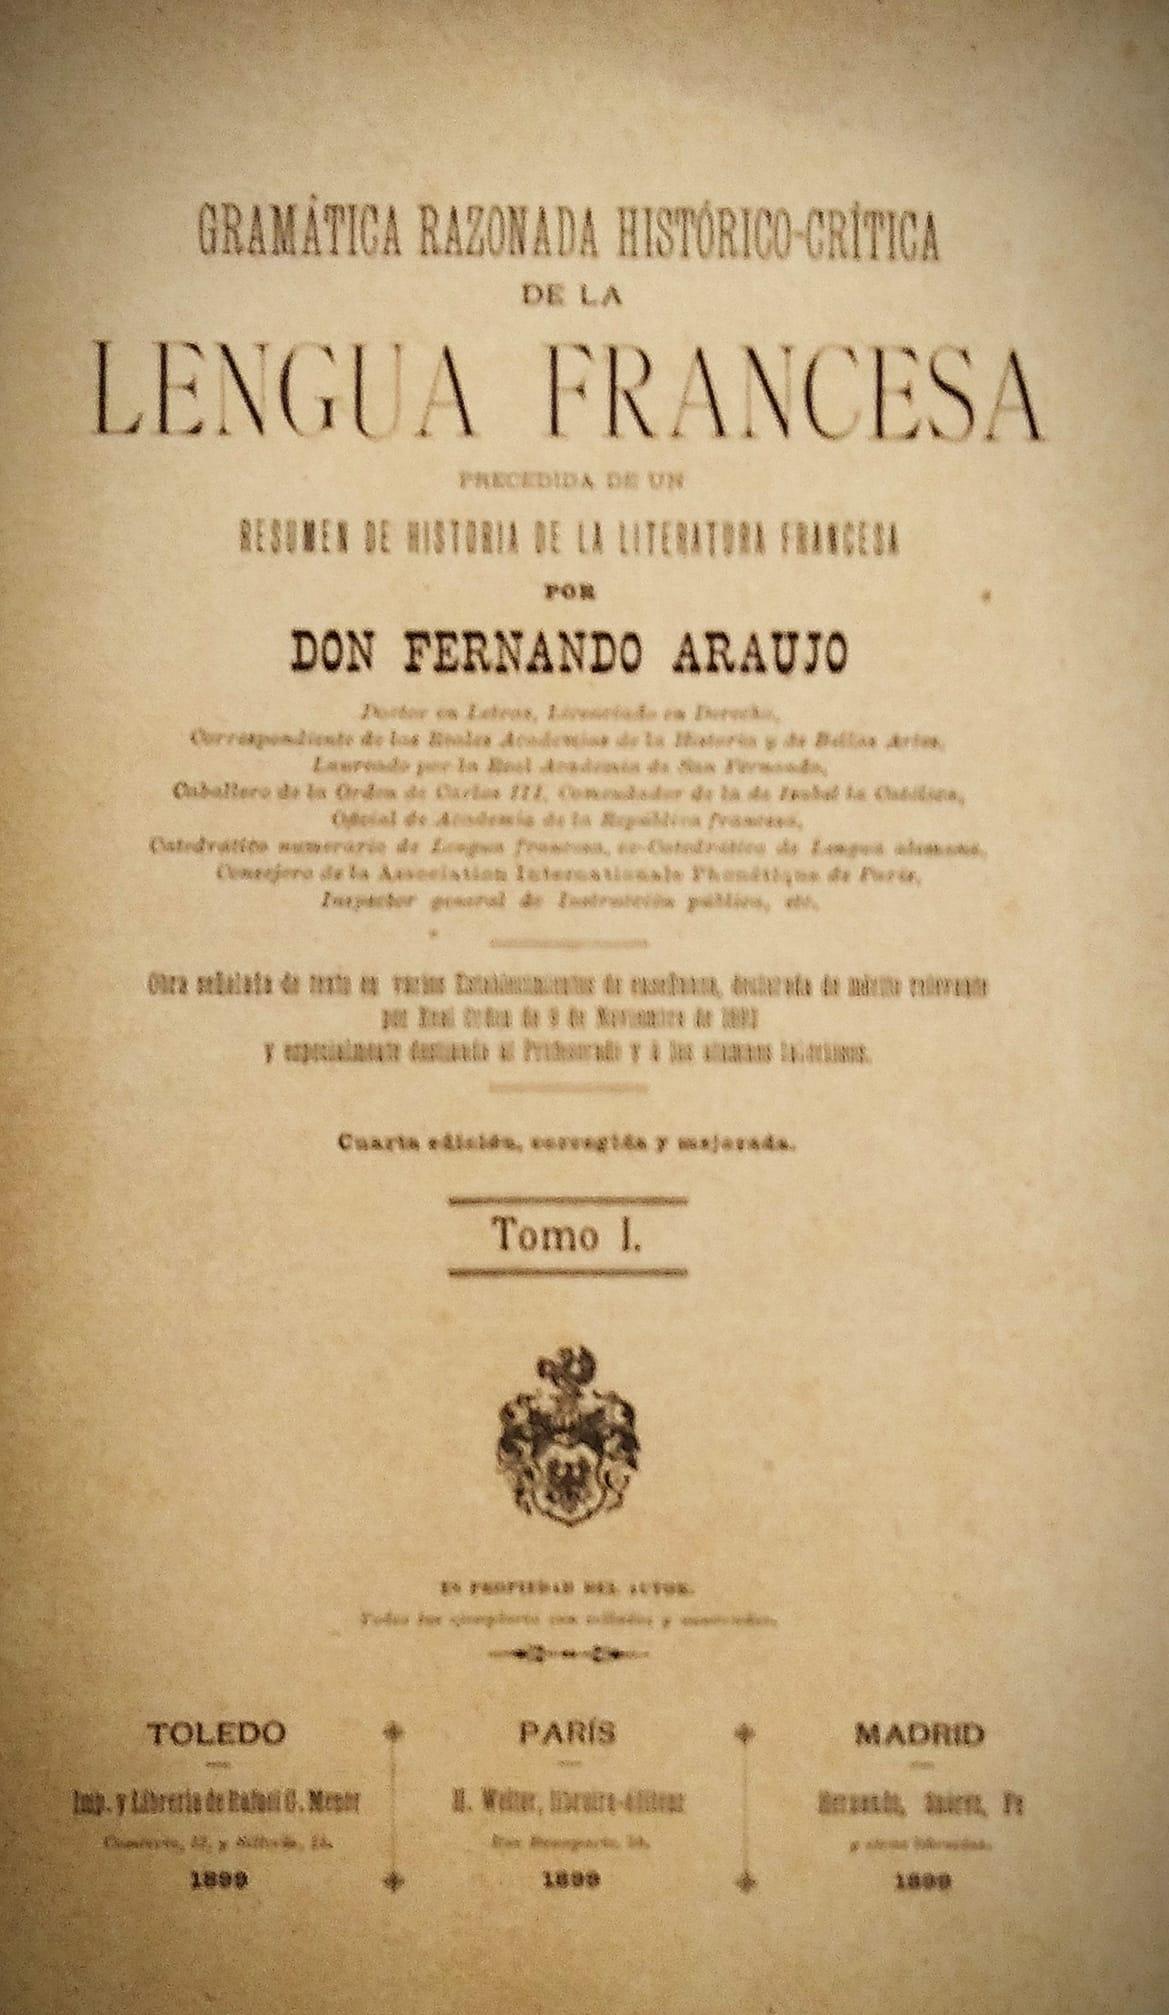 """A linguaxe é o vestido do pensamento"" (Samuel Johnson) . Tomo I da Gramática razonada histórico crítica da lingua francesa de Fernando Araújo. 1899."